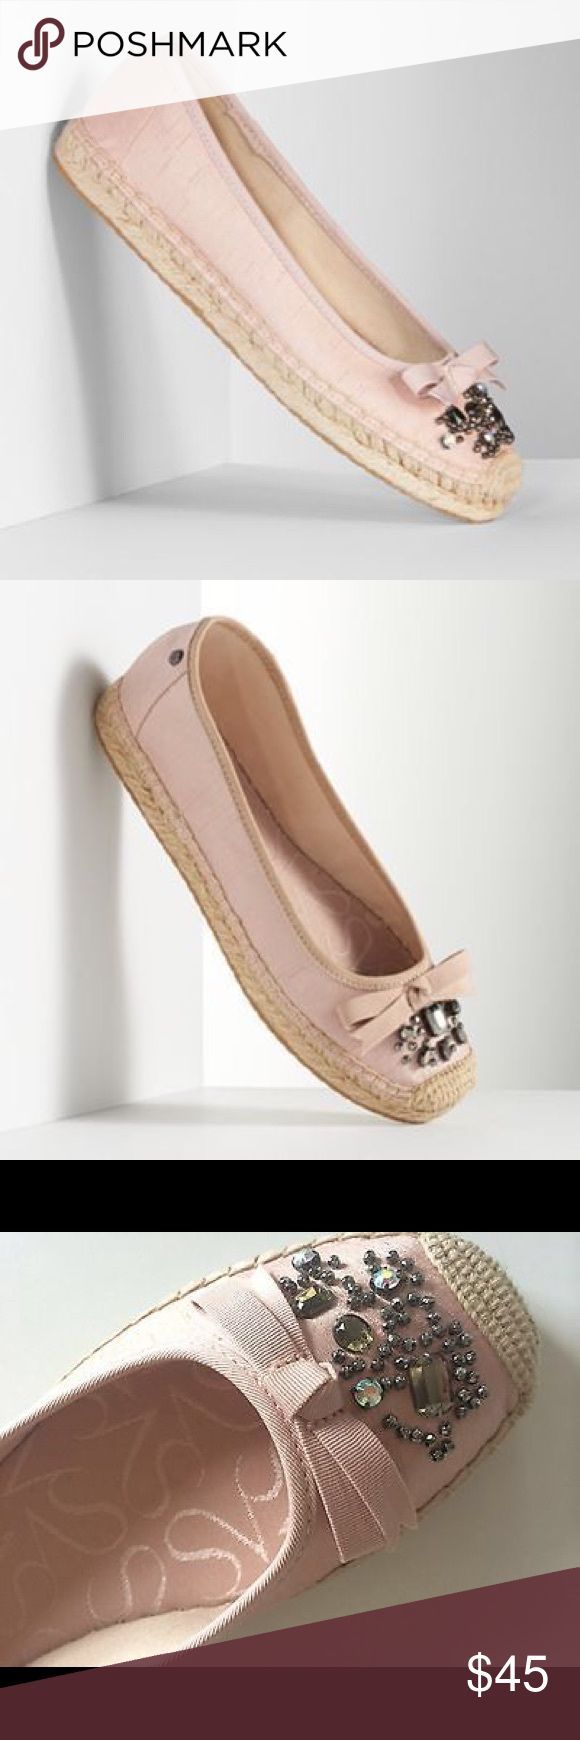 Vera Wang Blush Jeweled Espadrille Shoes Vera Wang blush iridescent w/pewter jeweled stone espadrille shoes will have you looking fab! Vera Wang Shoes Espadrilles